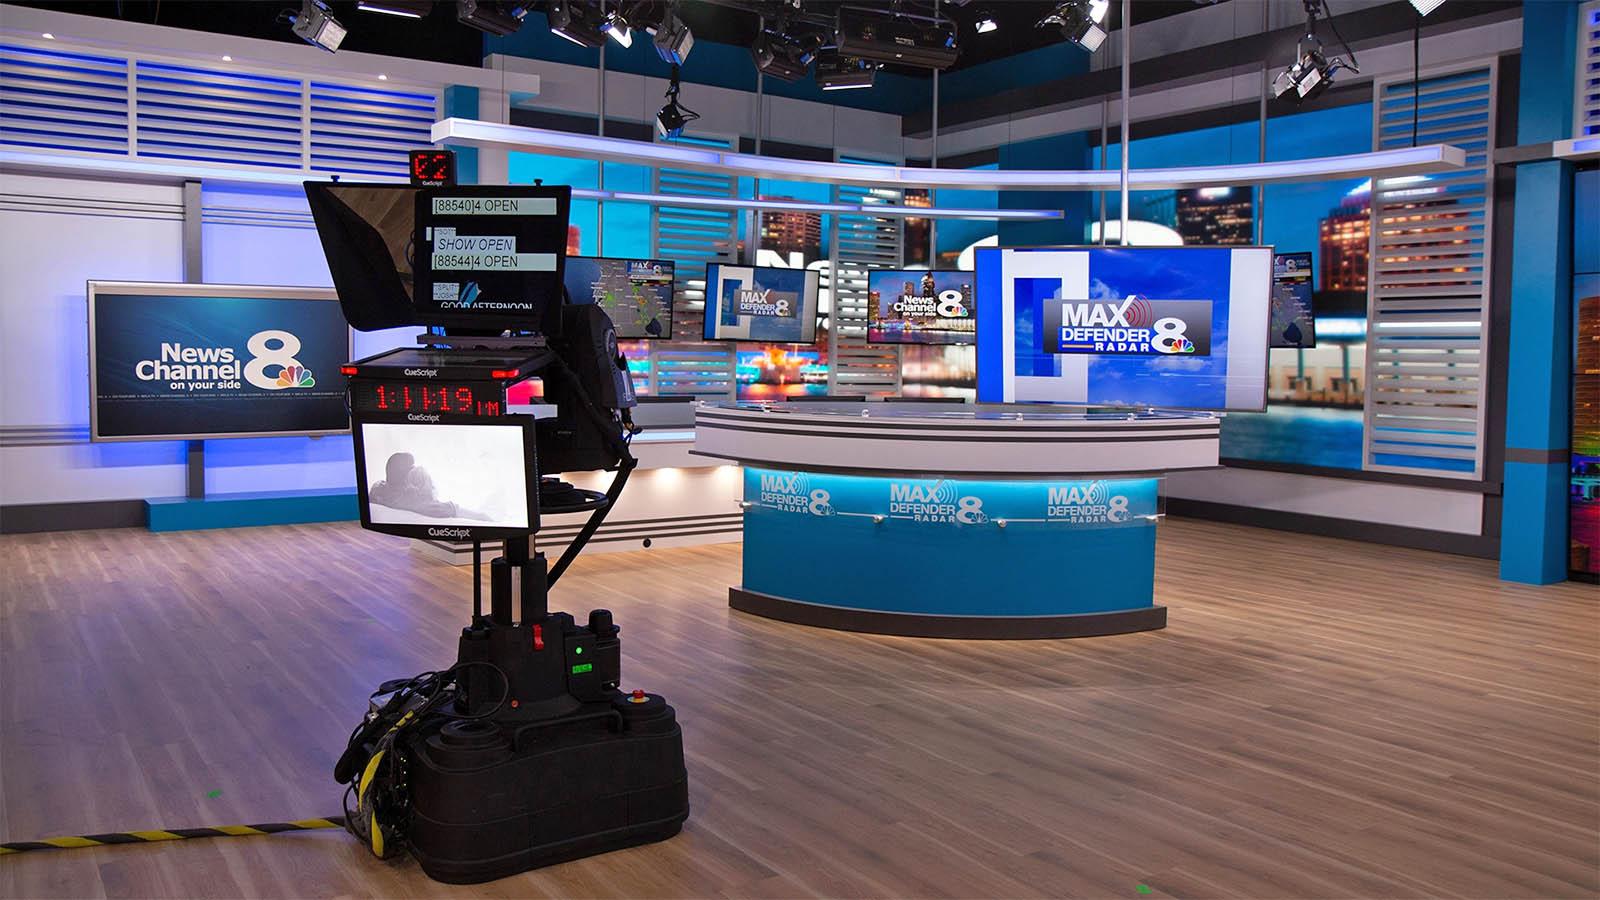 WFLA News Channel 8 studio